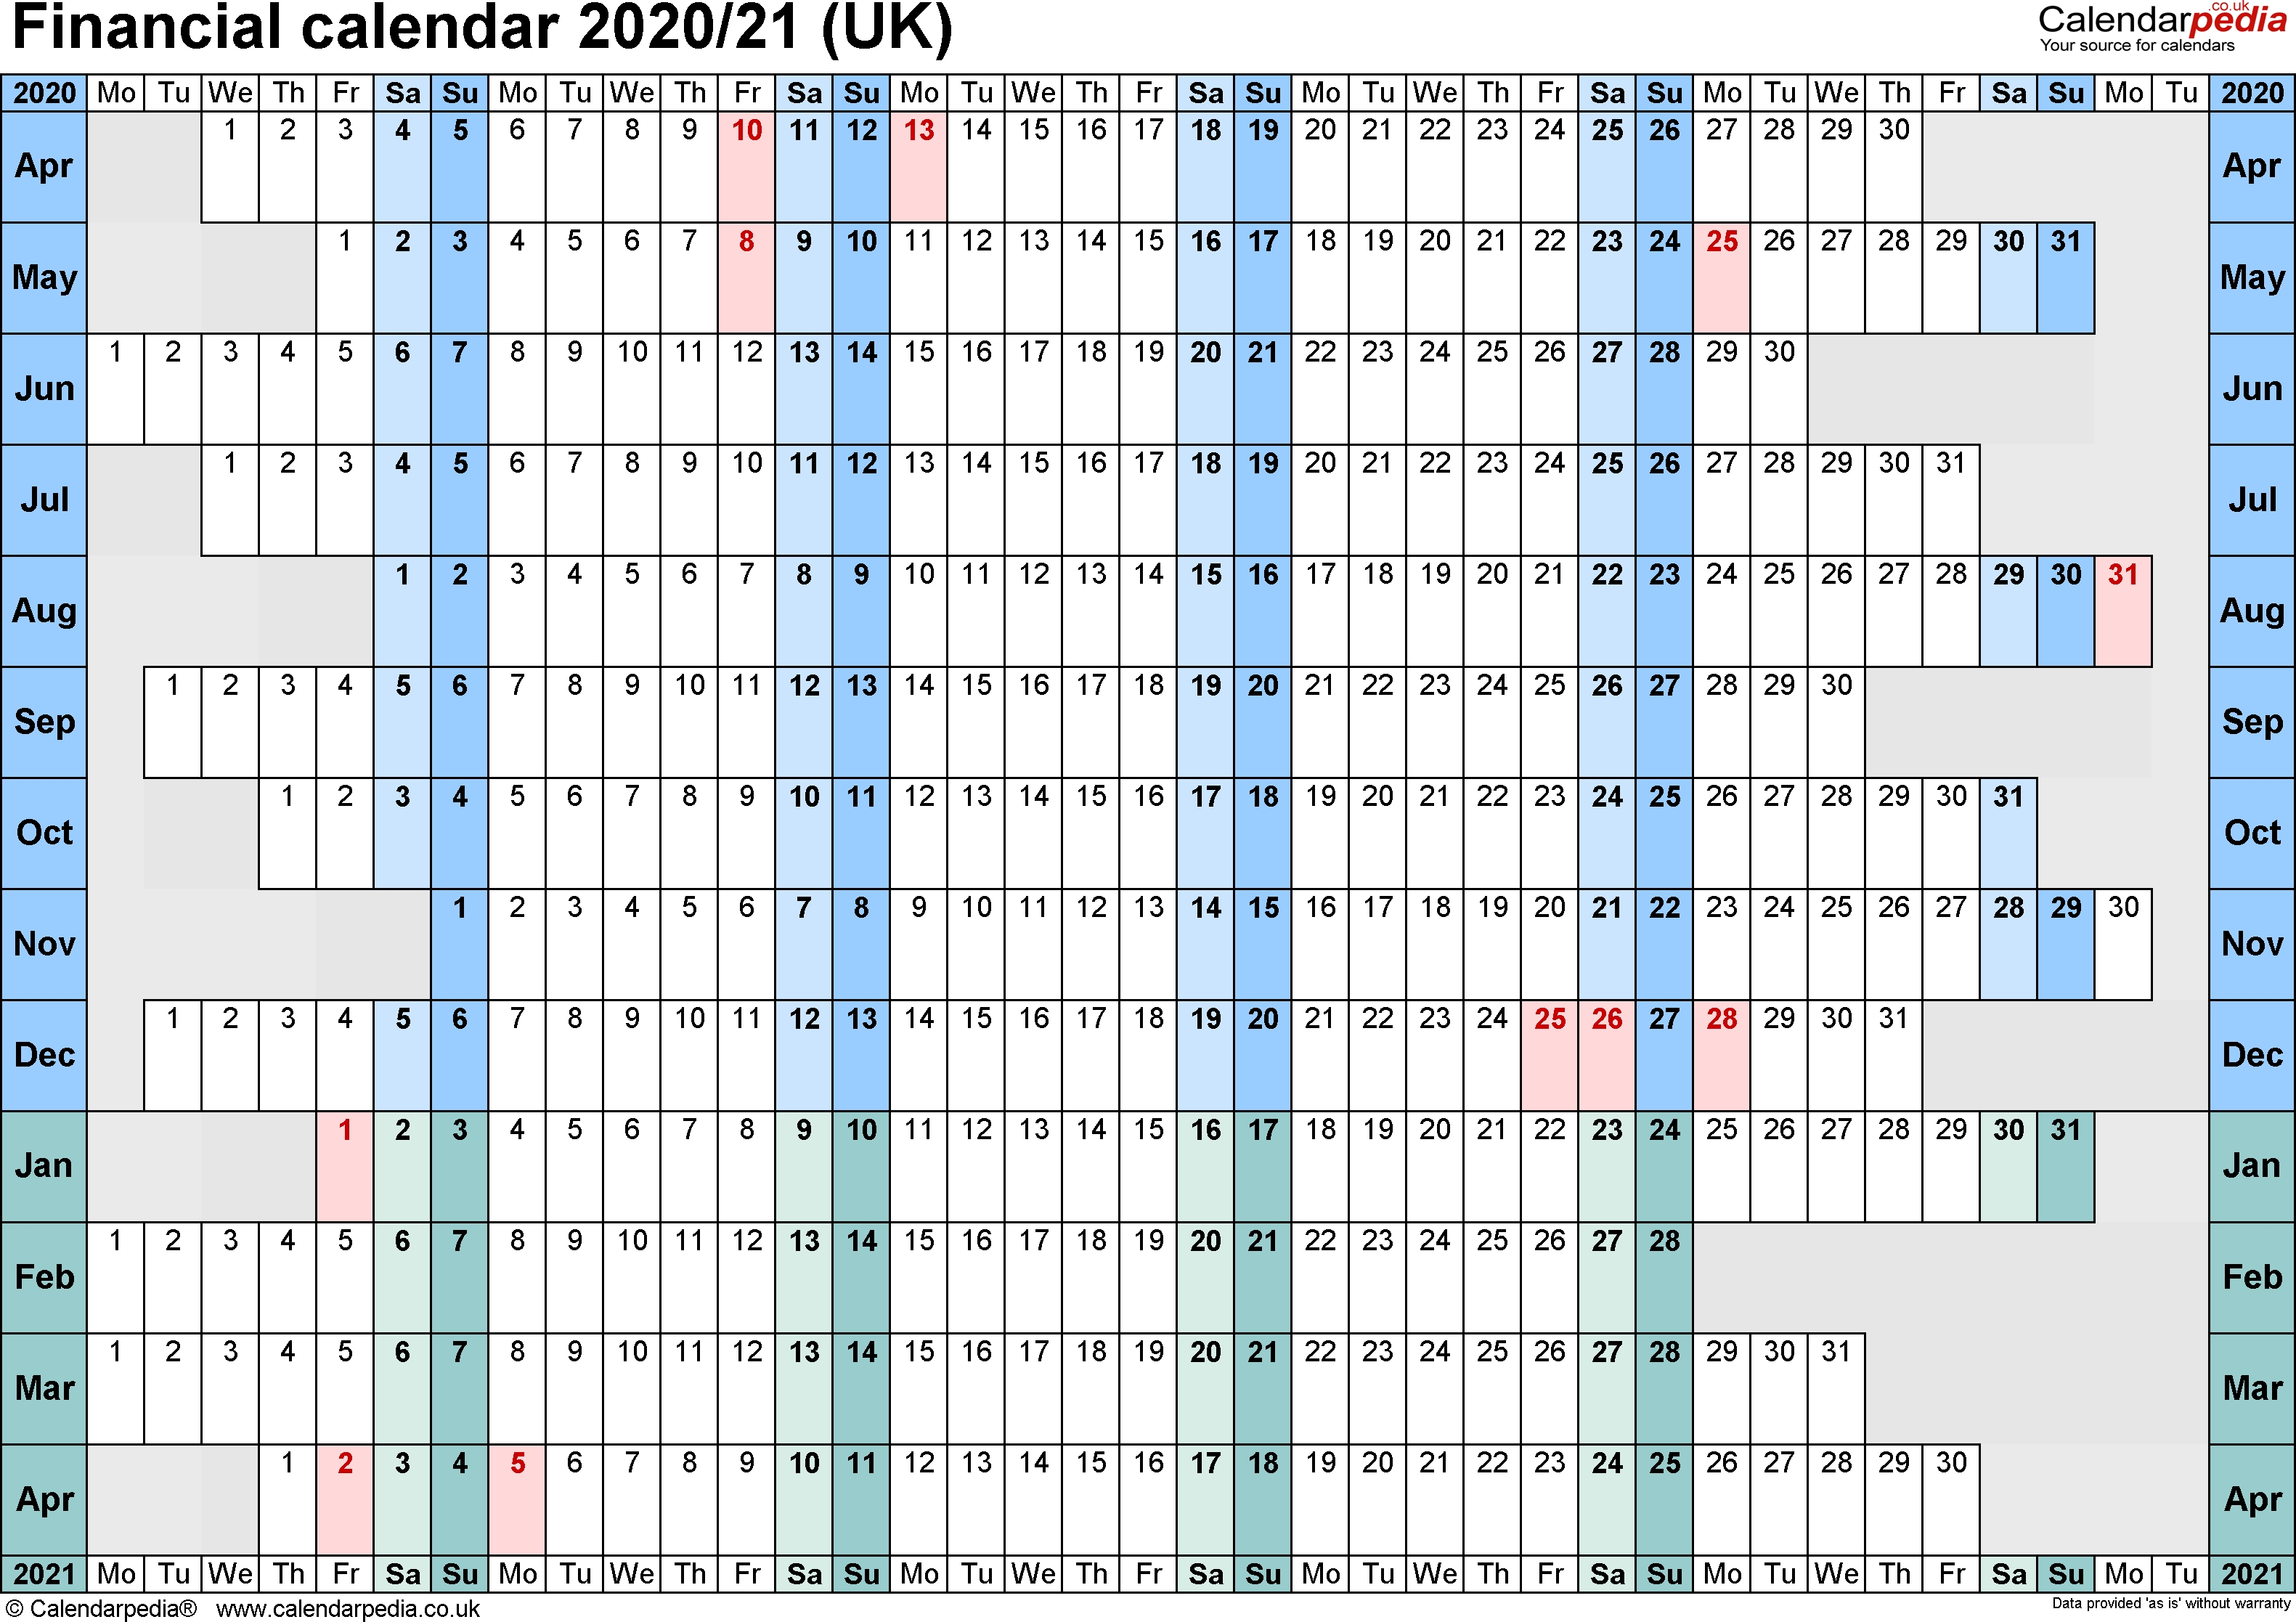 Financial Calendars 2020/21 (Uk) In Pdf Format  2020 2020 Financial Calendar